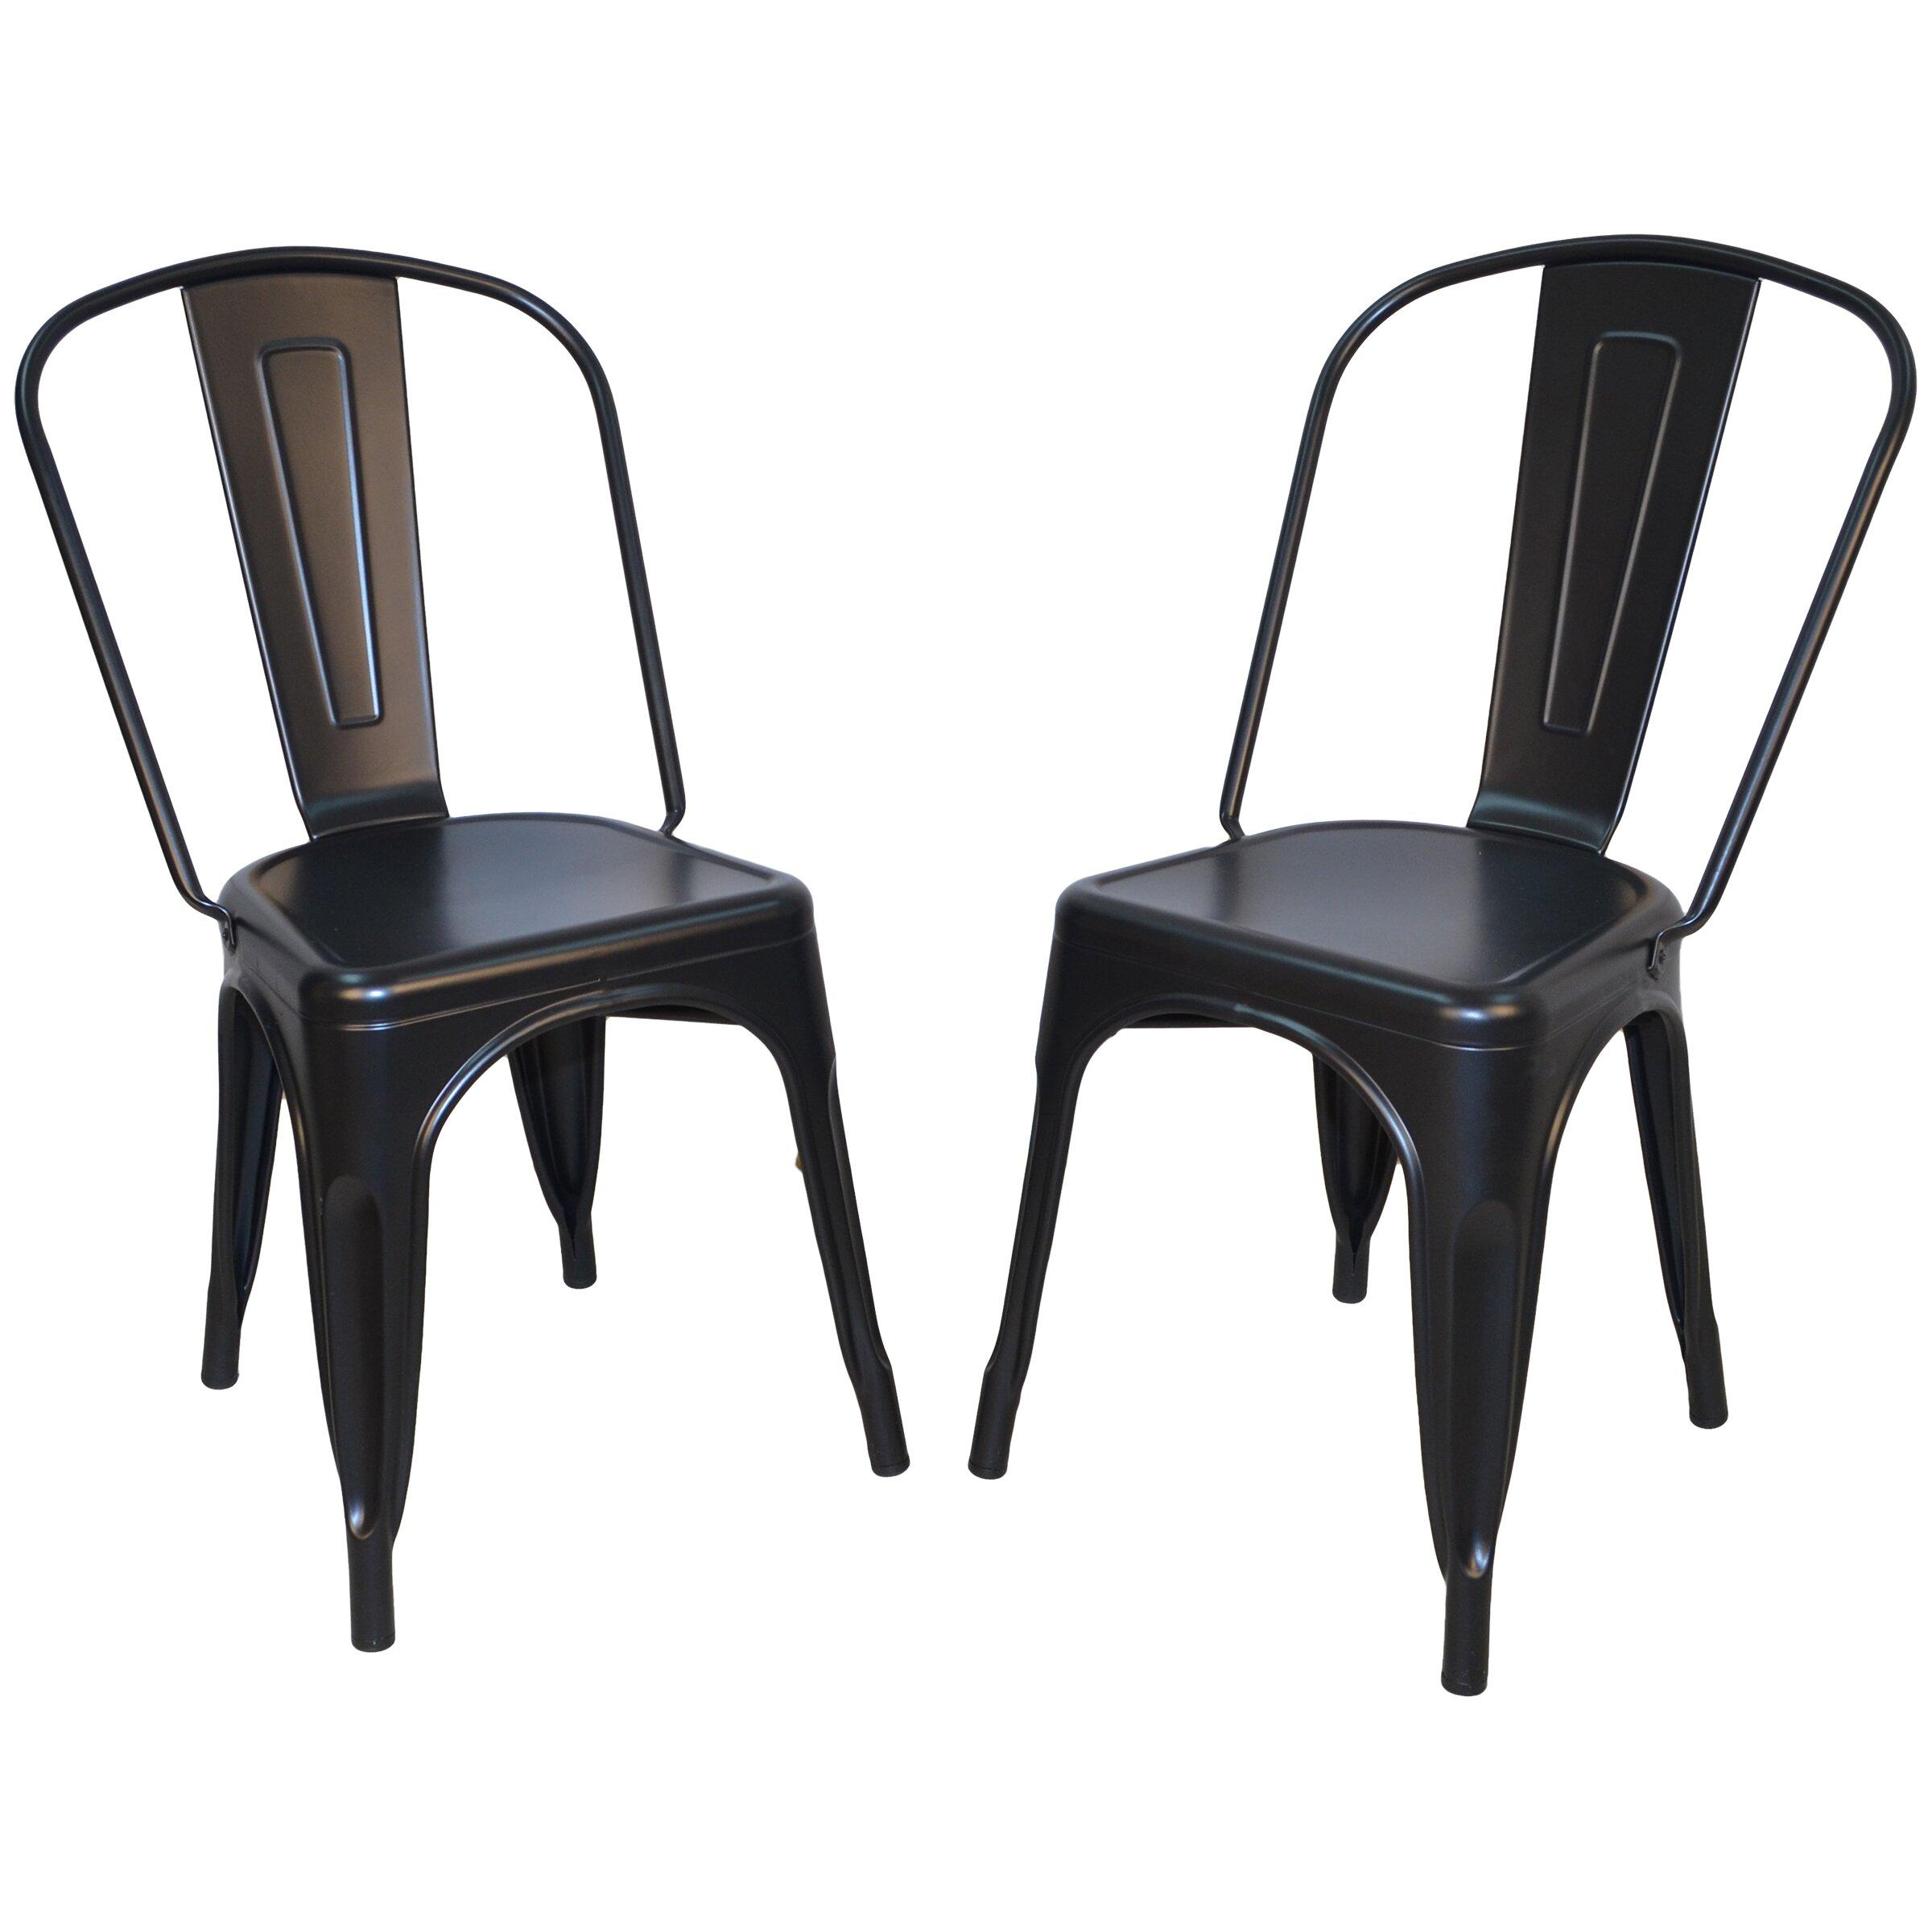 Laurel Foundry Modern Farmhouse Cerisier Side Chair